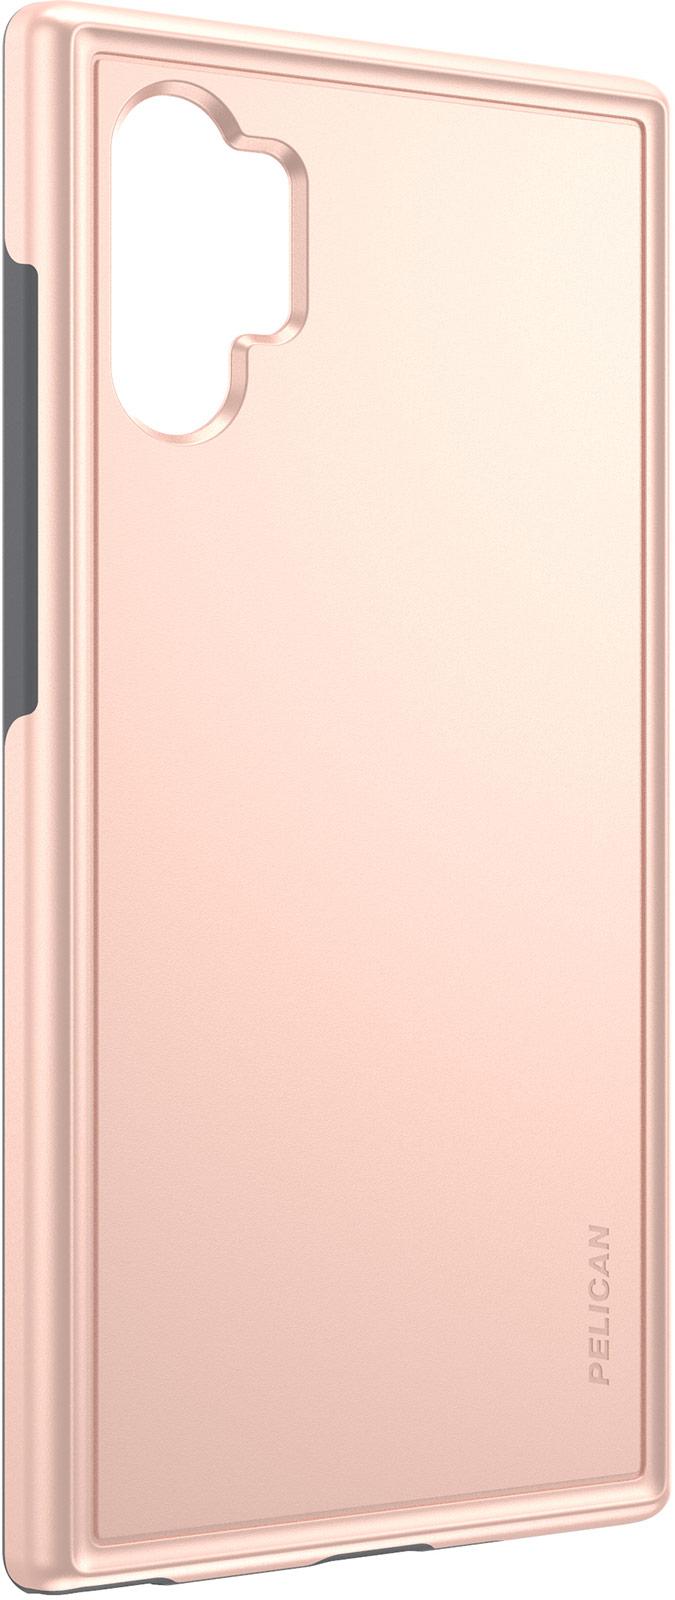 pelican galaxy note10 plus rose gold hard case